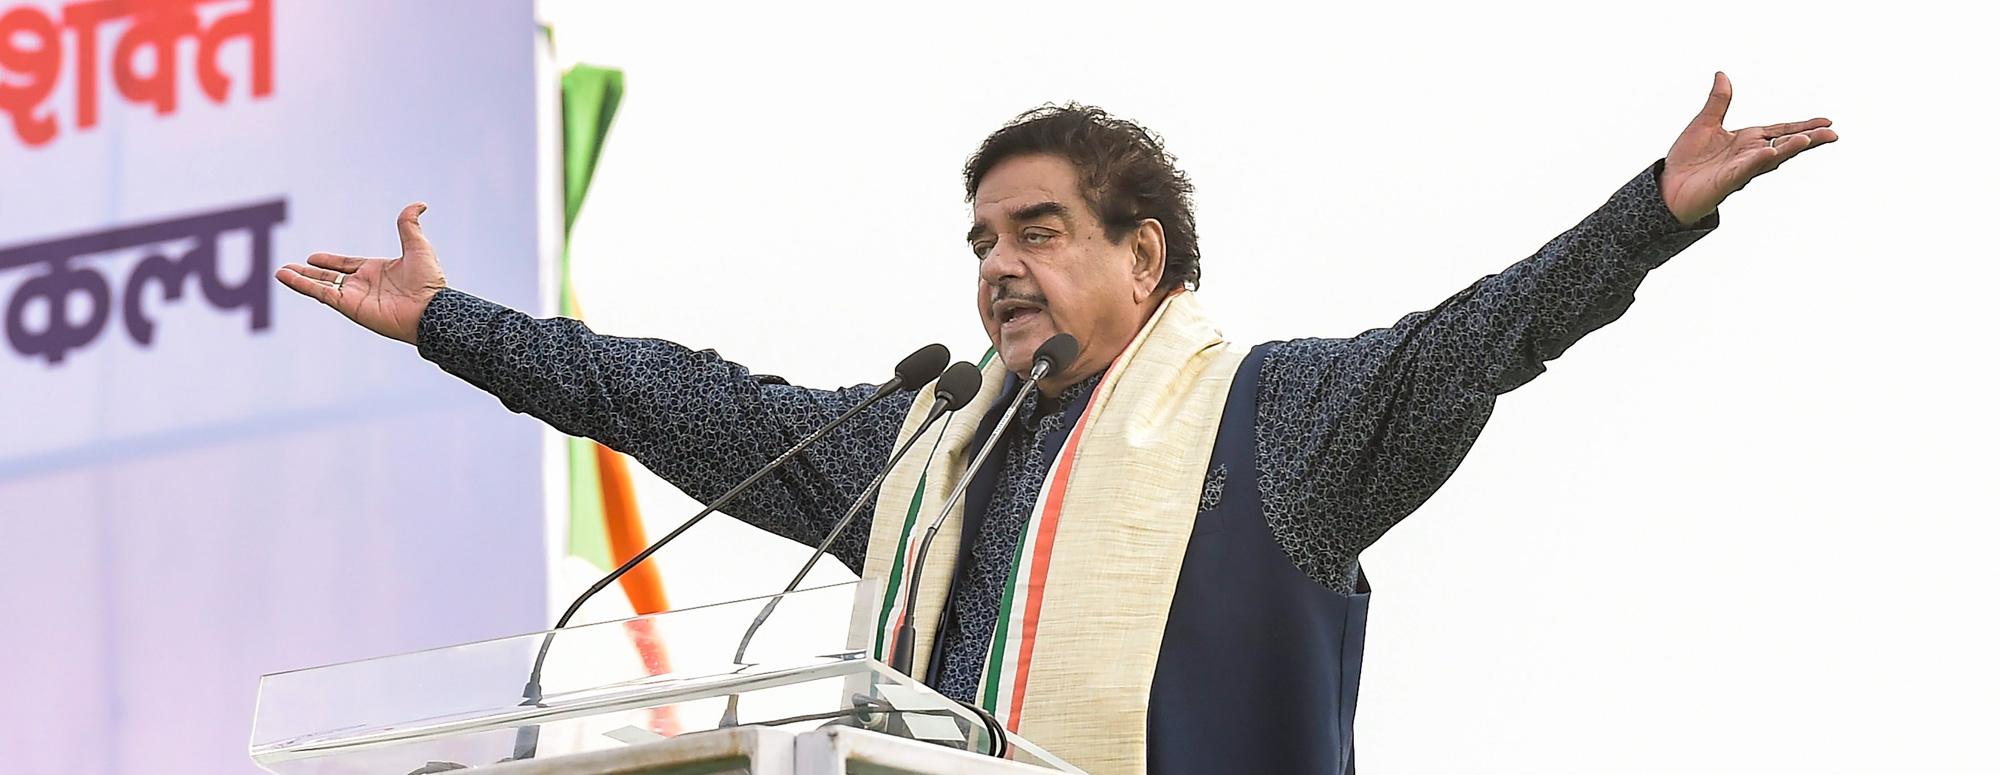 Actor-MP Shatrughan Sinha addresses during Trinamool Congress (TMC)'s mega rally 'Brigade Samavesh' in Calcutta on Saturday, January 19, 2019.